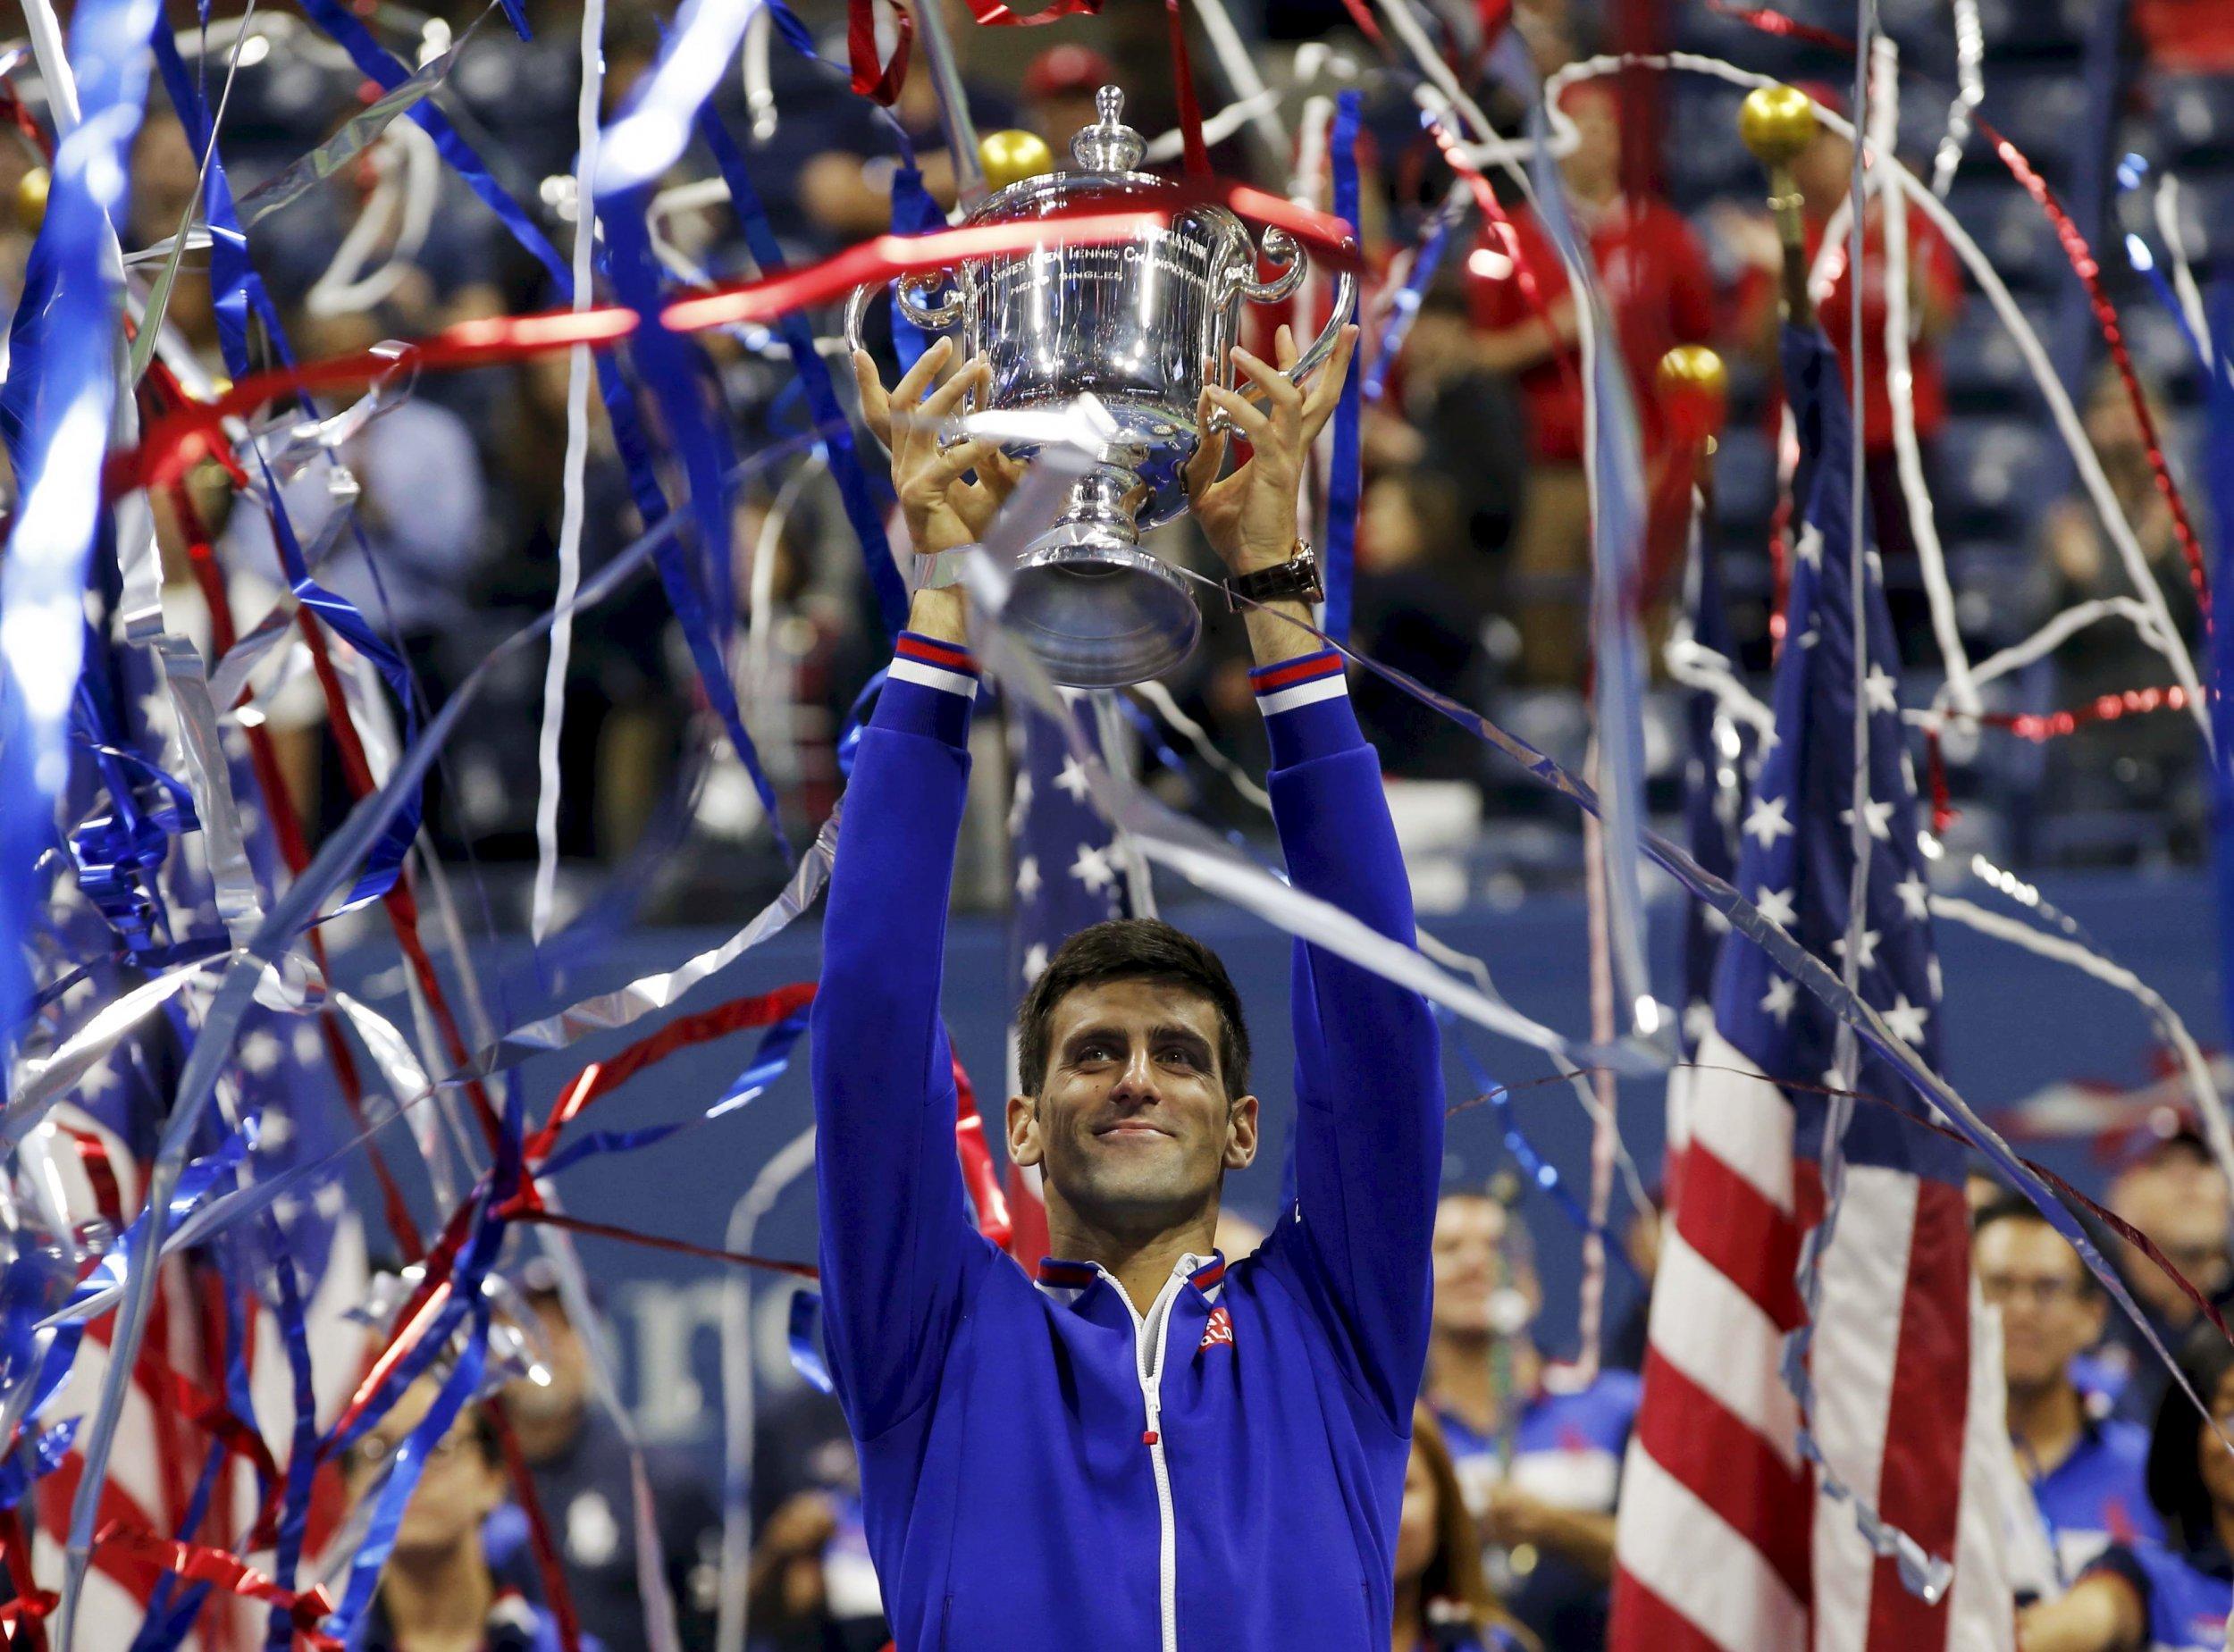 09_14_Roger Federer Novak Djokovic U.S. Open